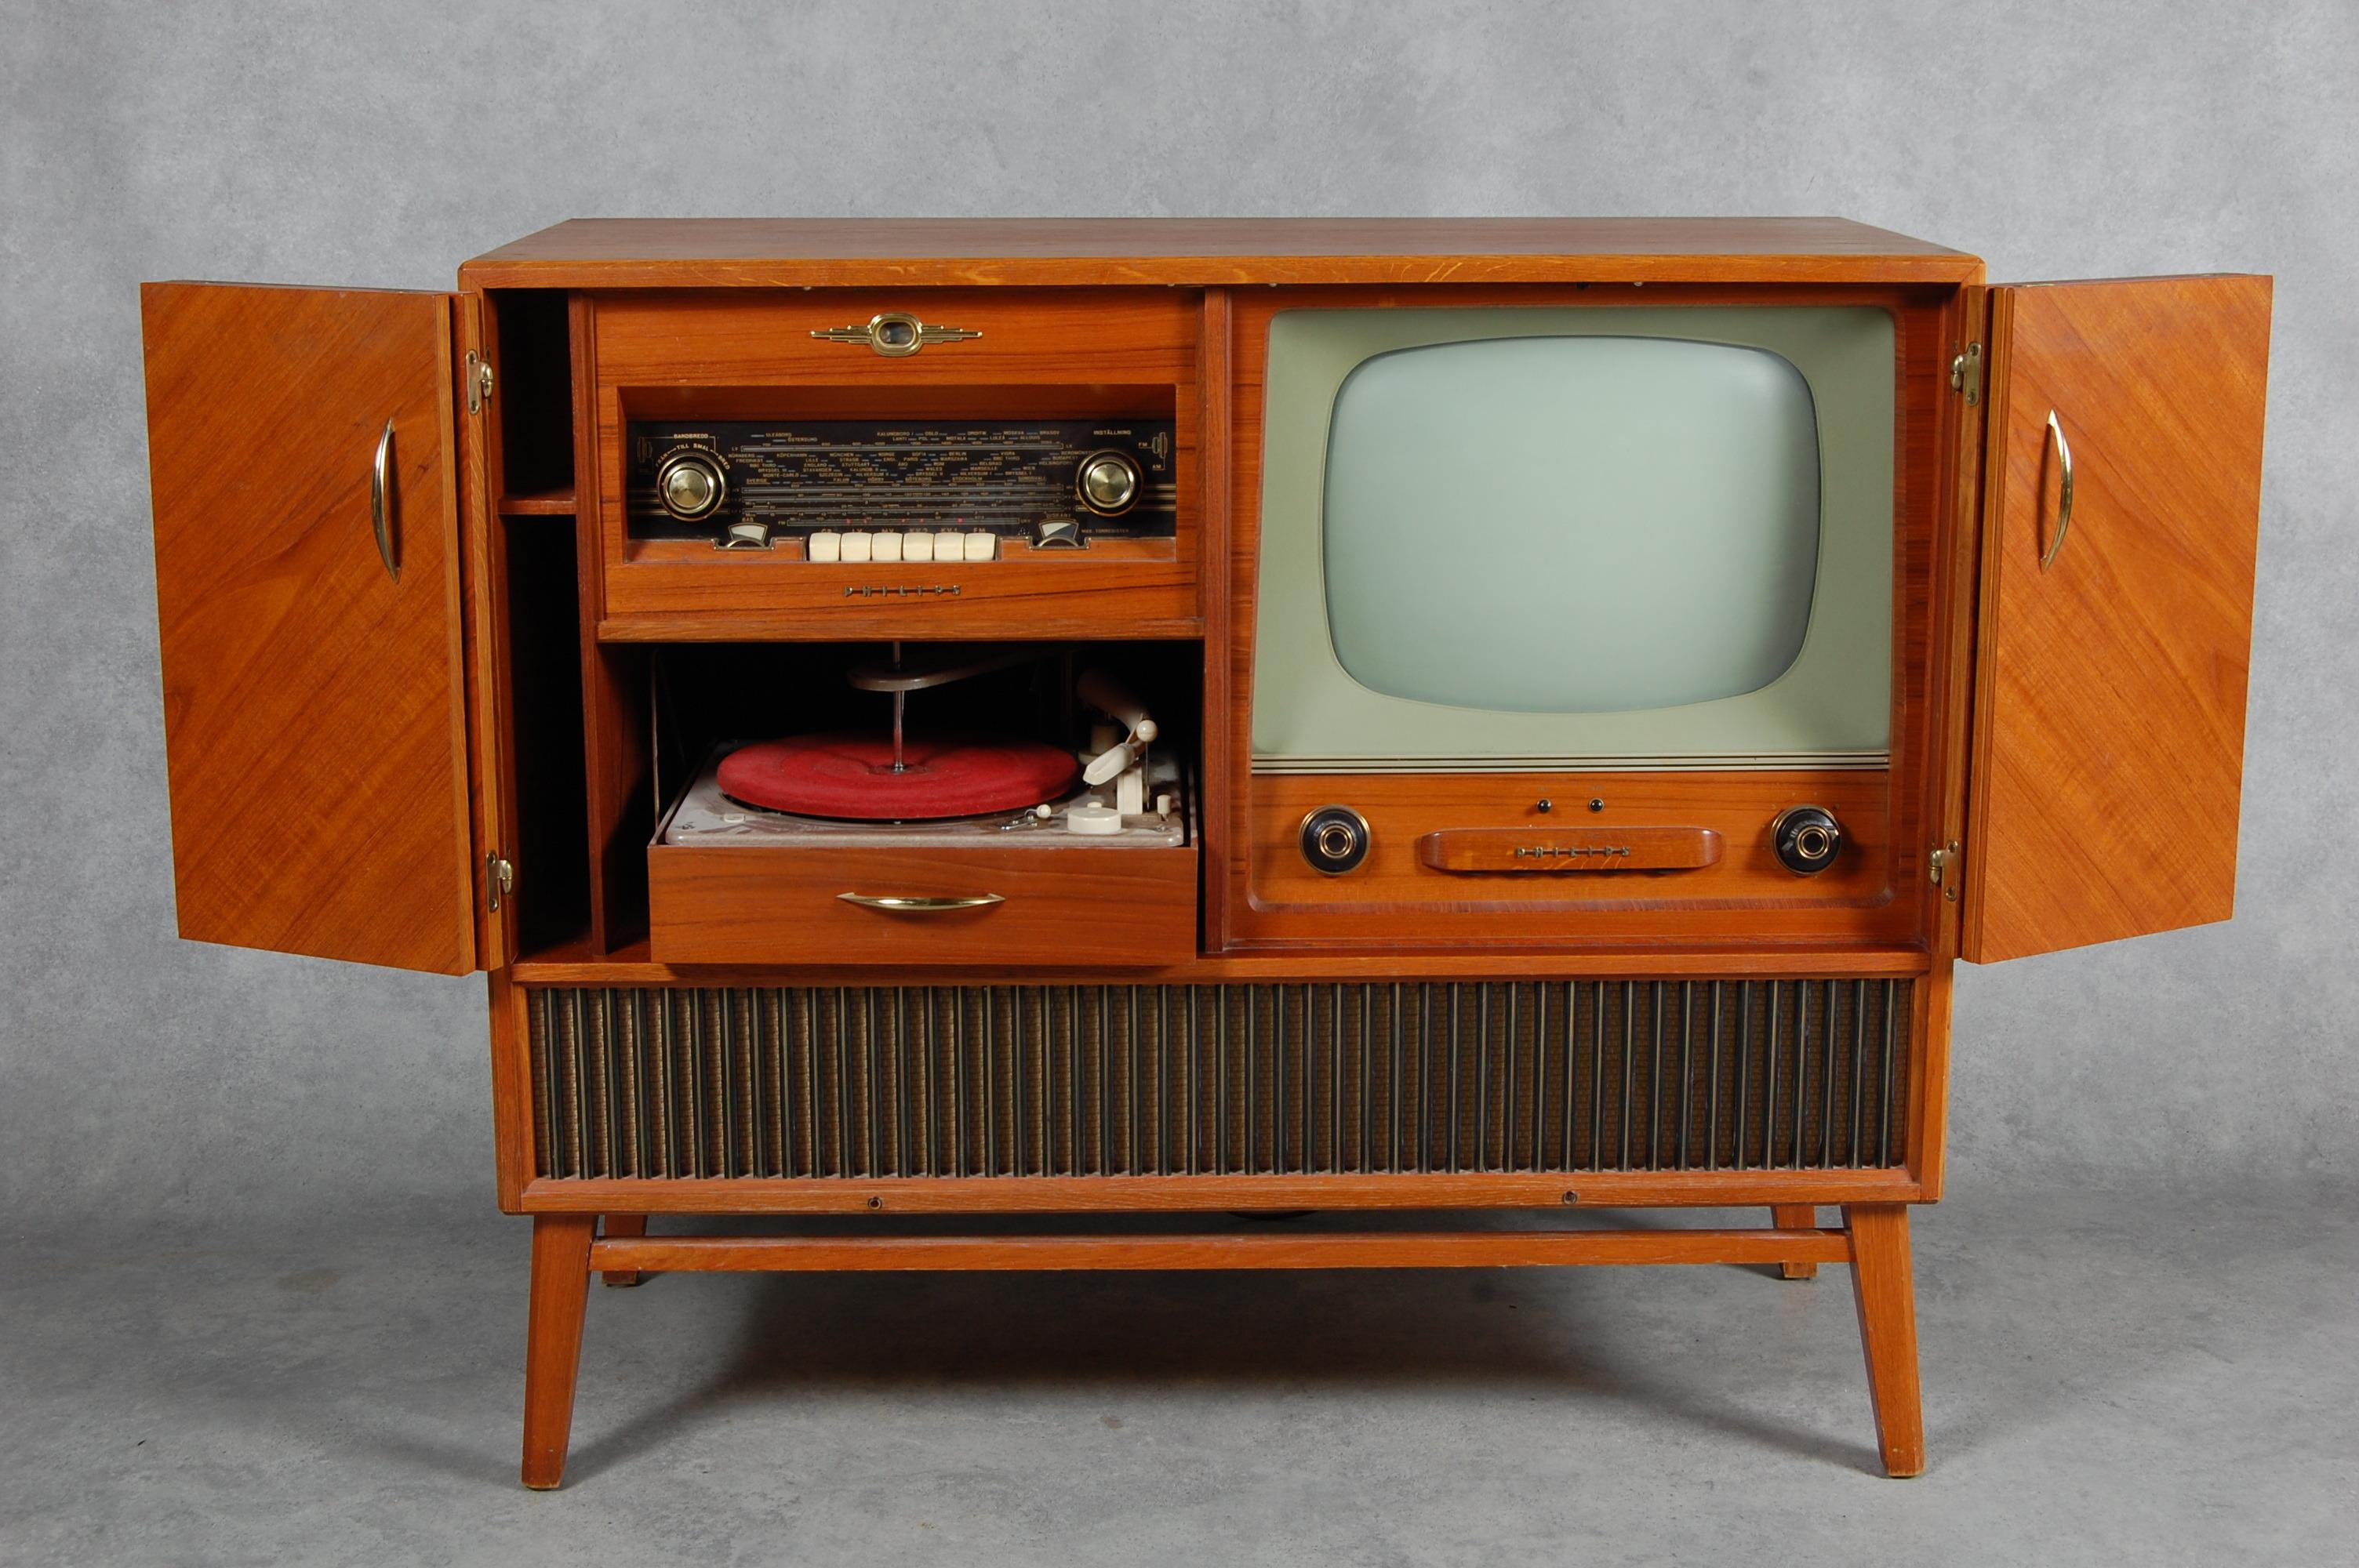 Tv Radio Meubel : Tv radio möbel philips tal other technica nautica auctionet